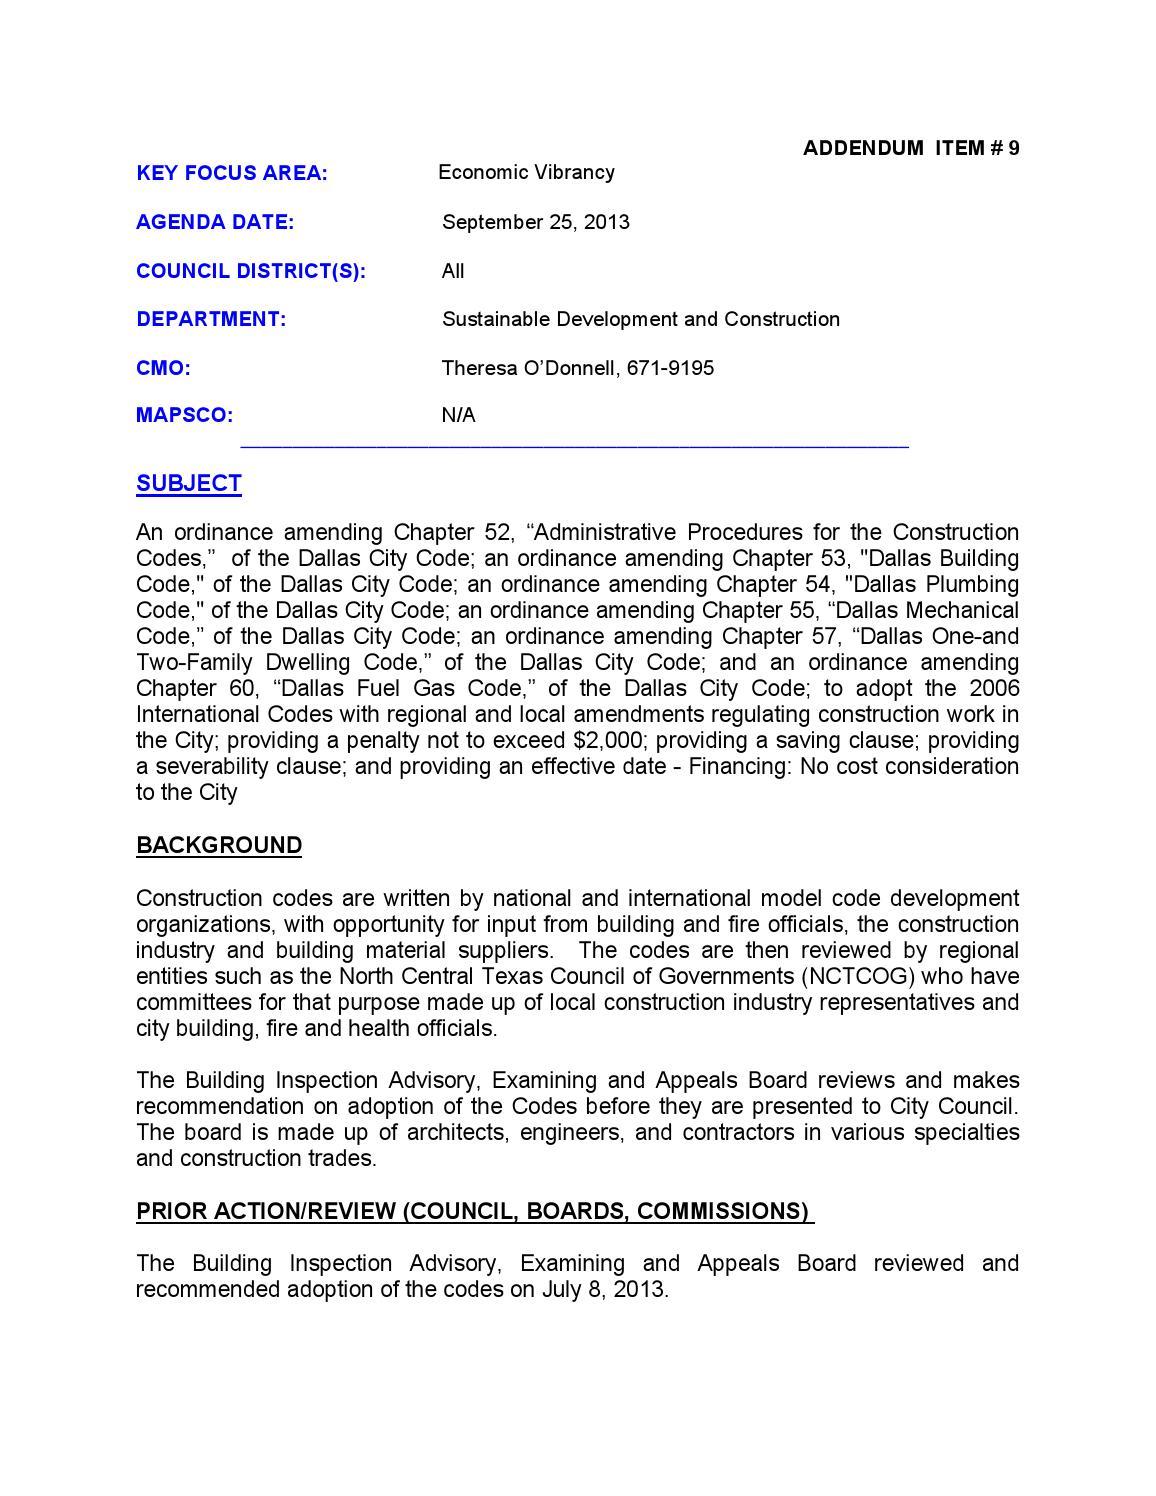 Medical abbreviation for addendum - Dallas City Council Agenda September 25 2013 Addendum Part Ii By Buildingcommunityworkshop Issuu